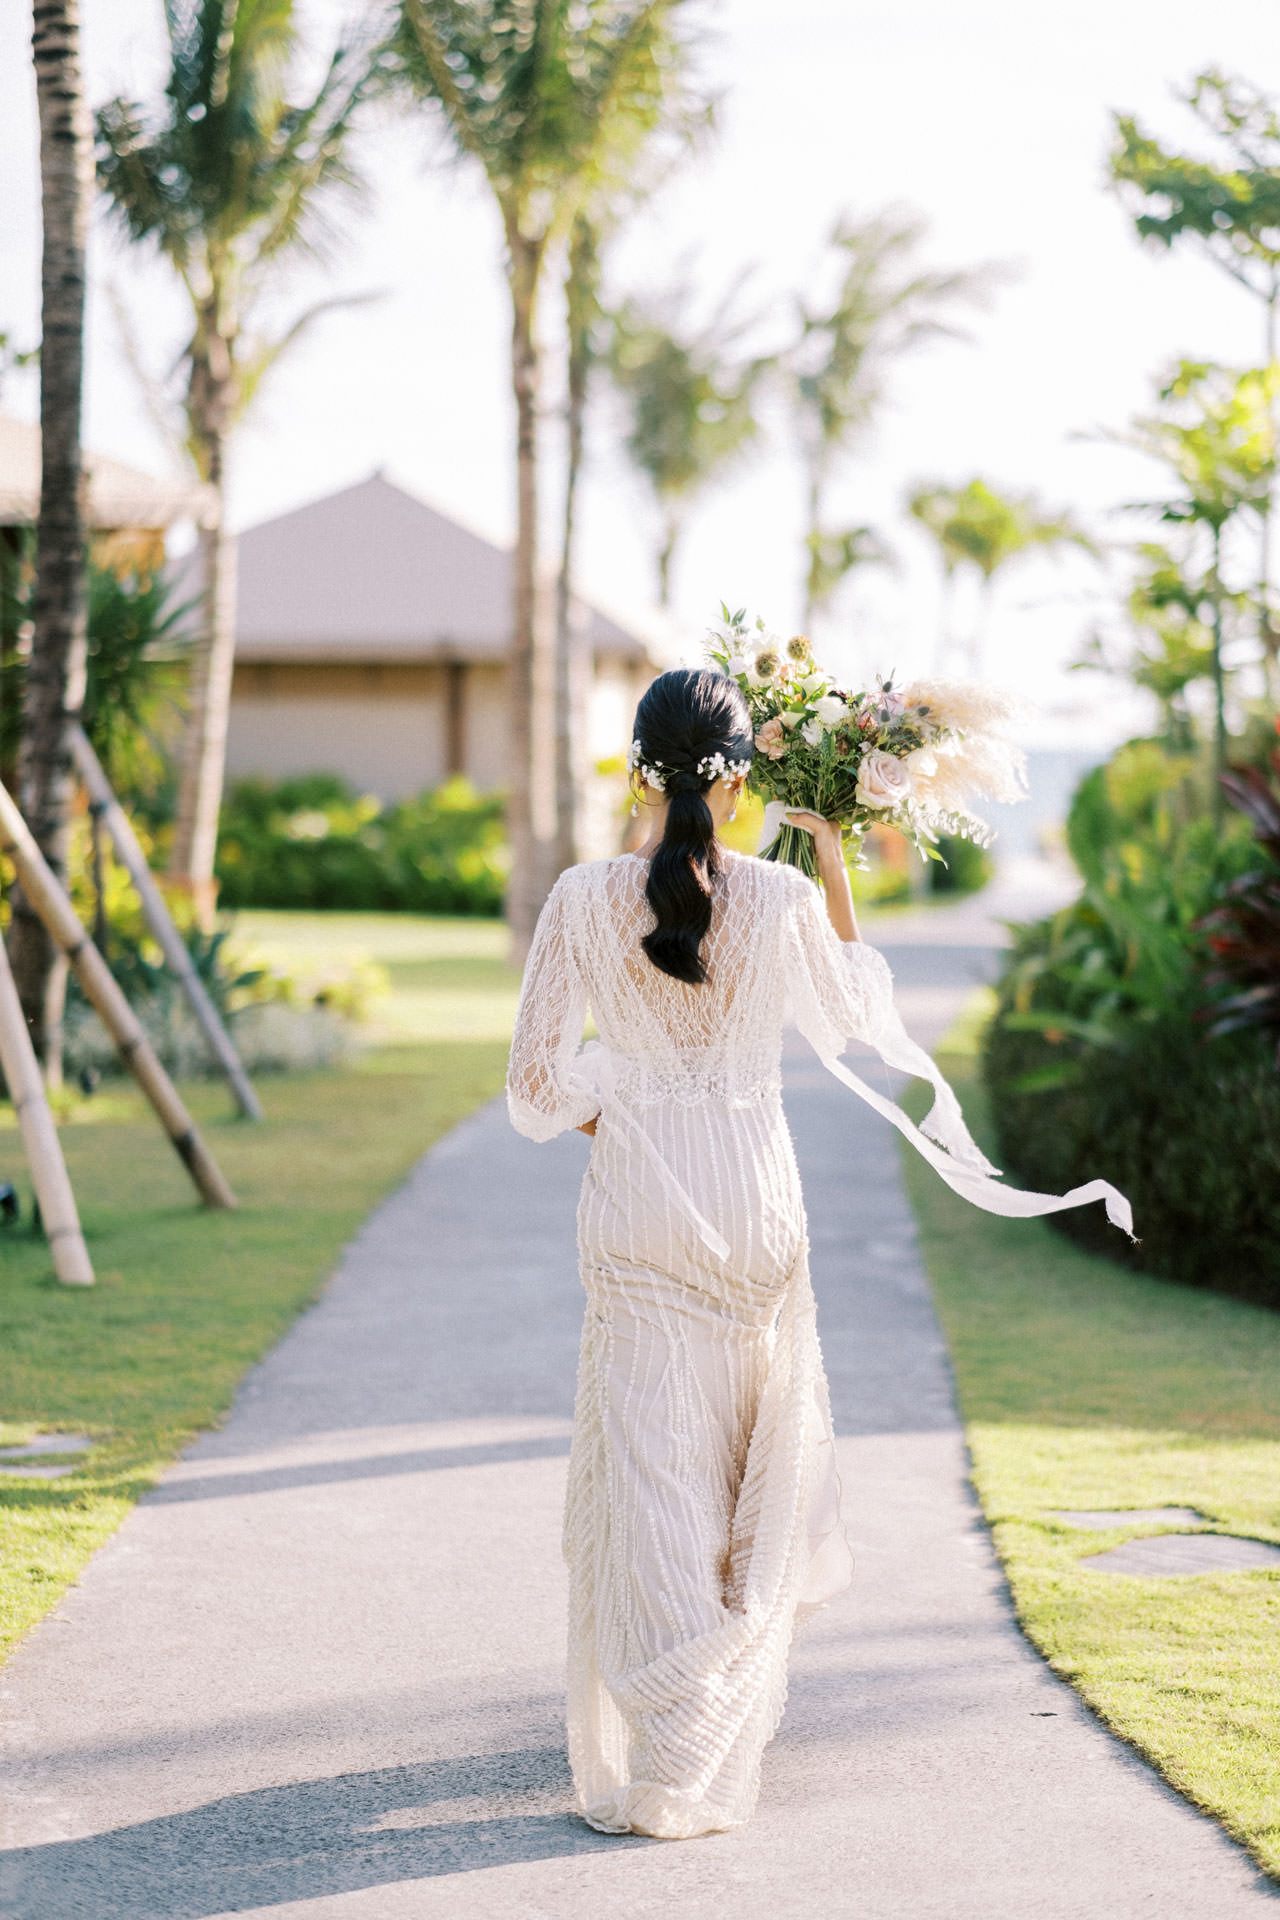 Bali Beach Glamping Wedding on a Luxury Tent 26